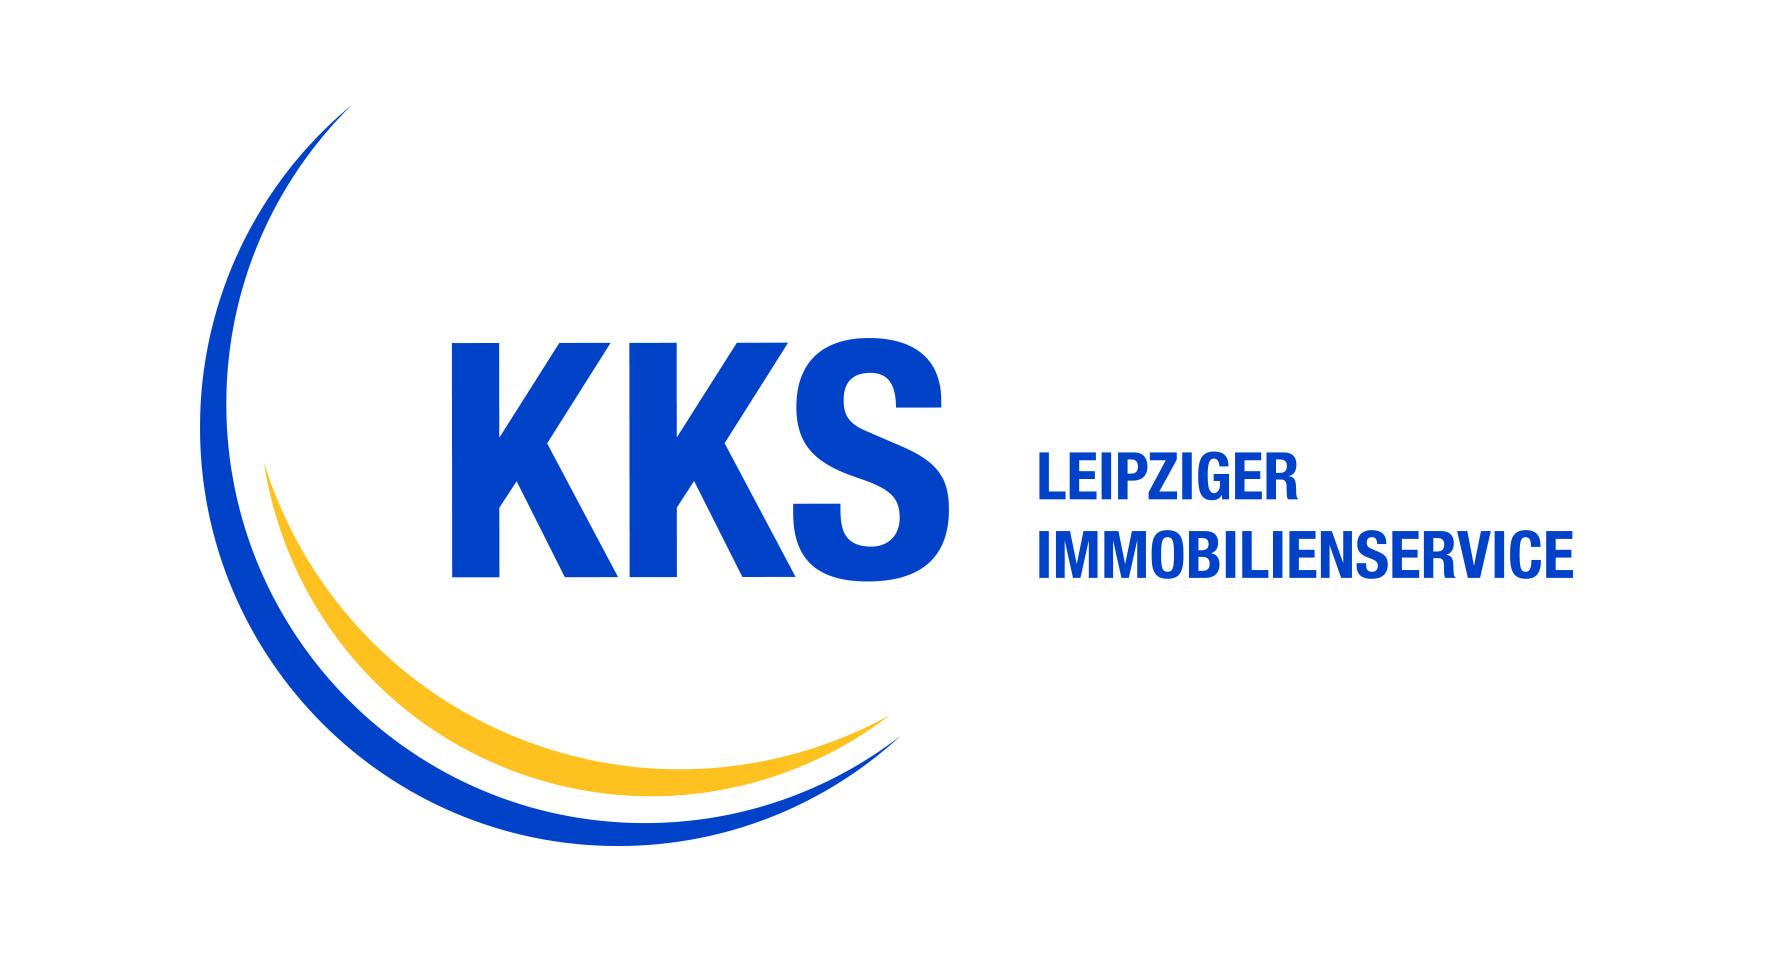 KKS Leipziger Immobilienservice Logo